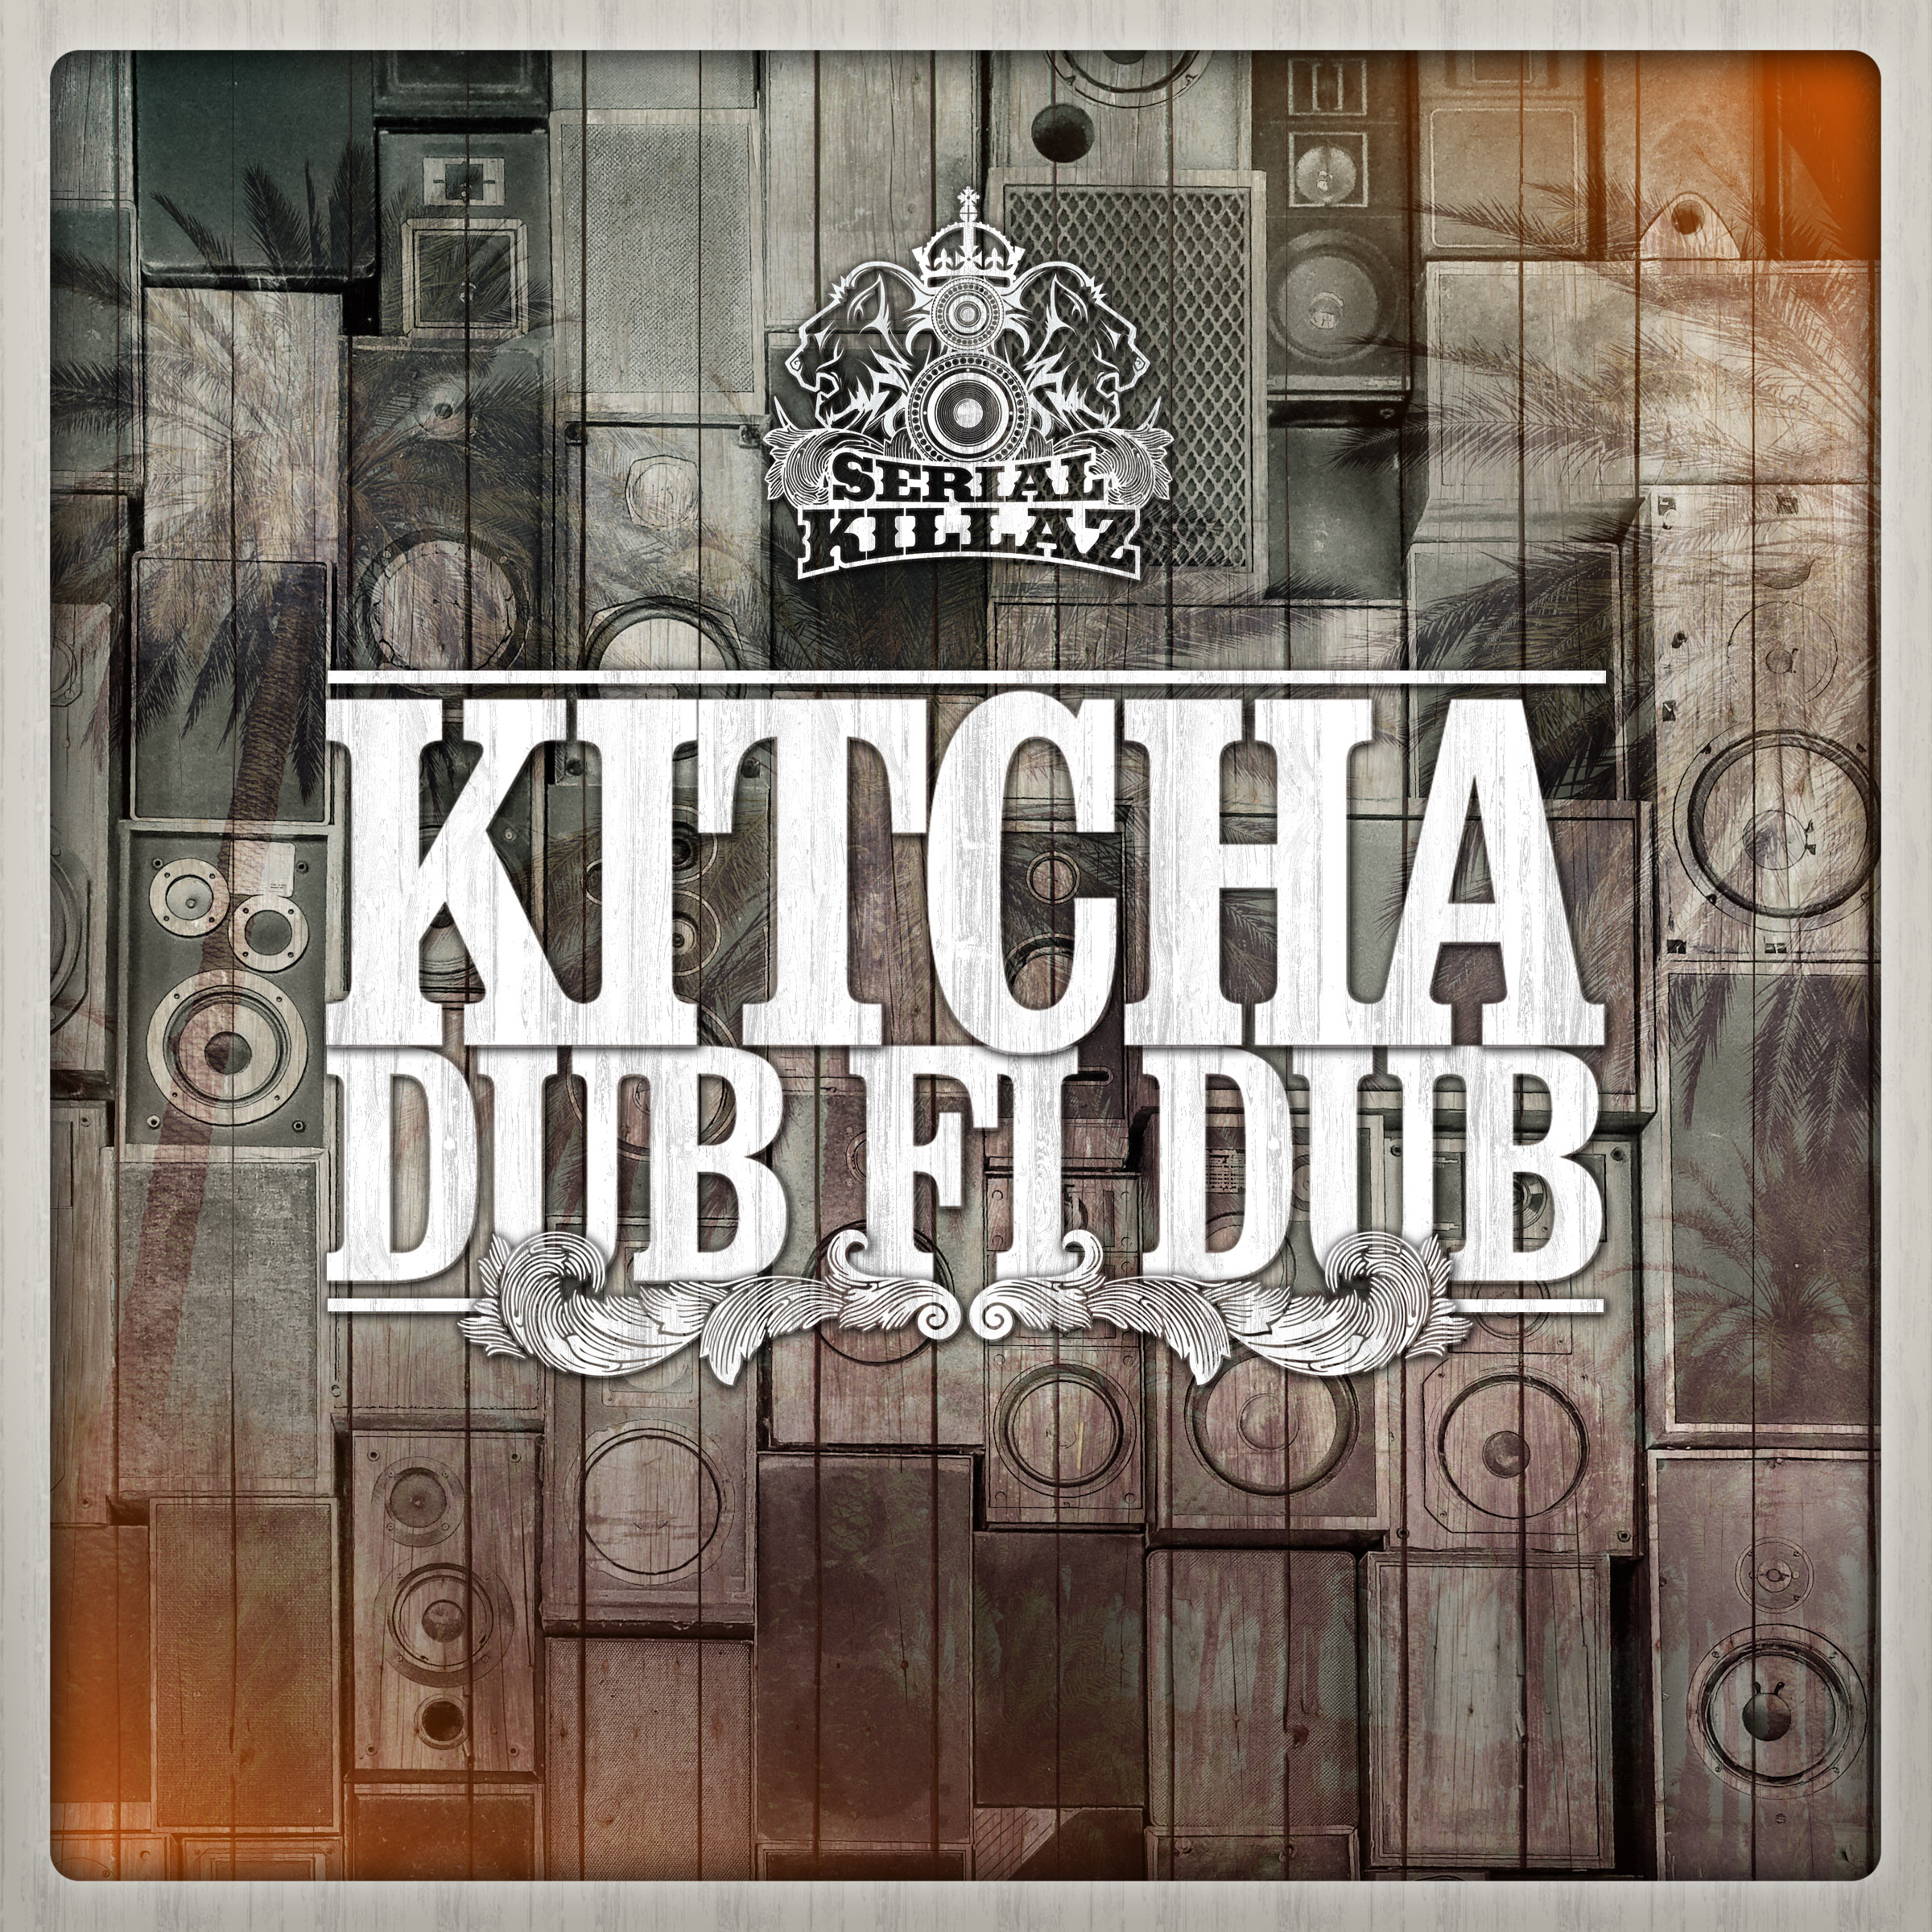 DJ Kitcha - Tune Fi Tune Dub Fi Dub EP